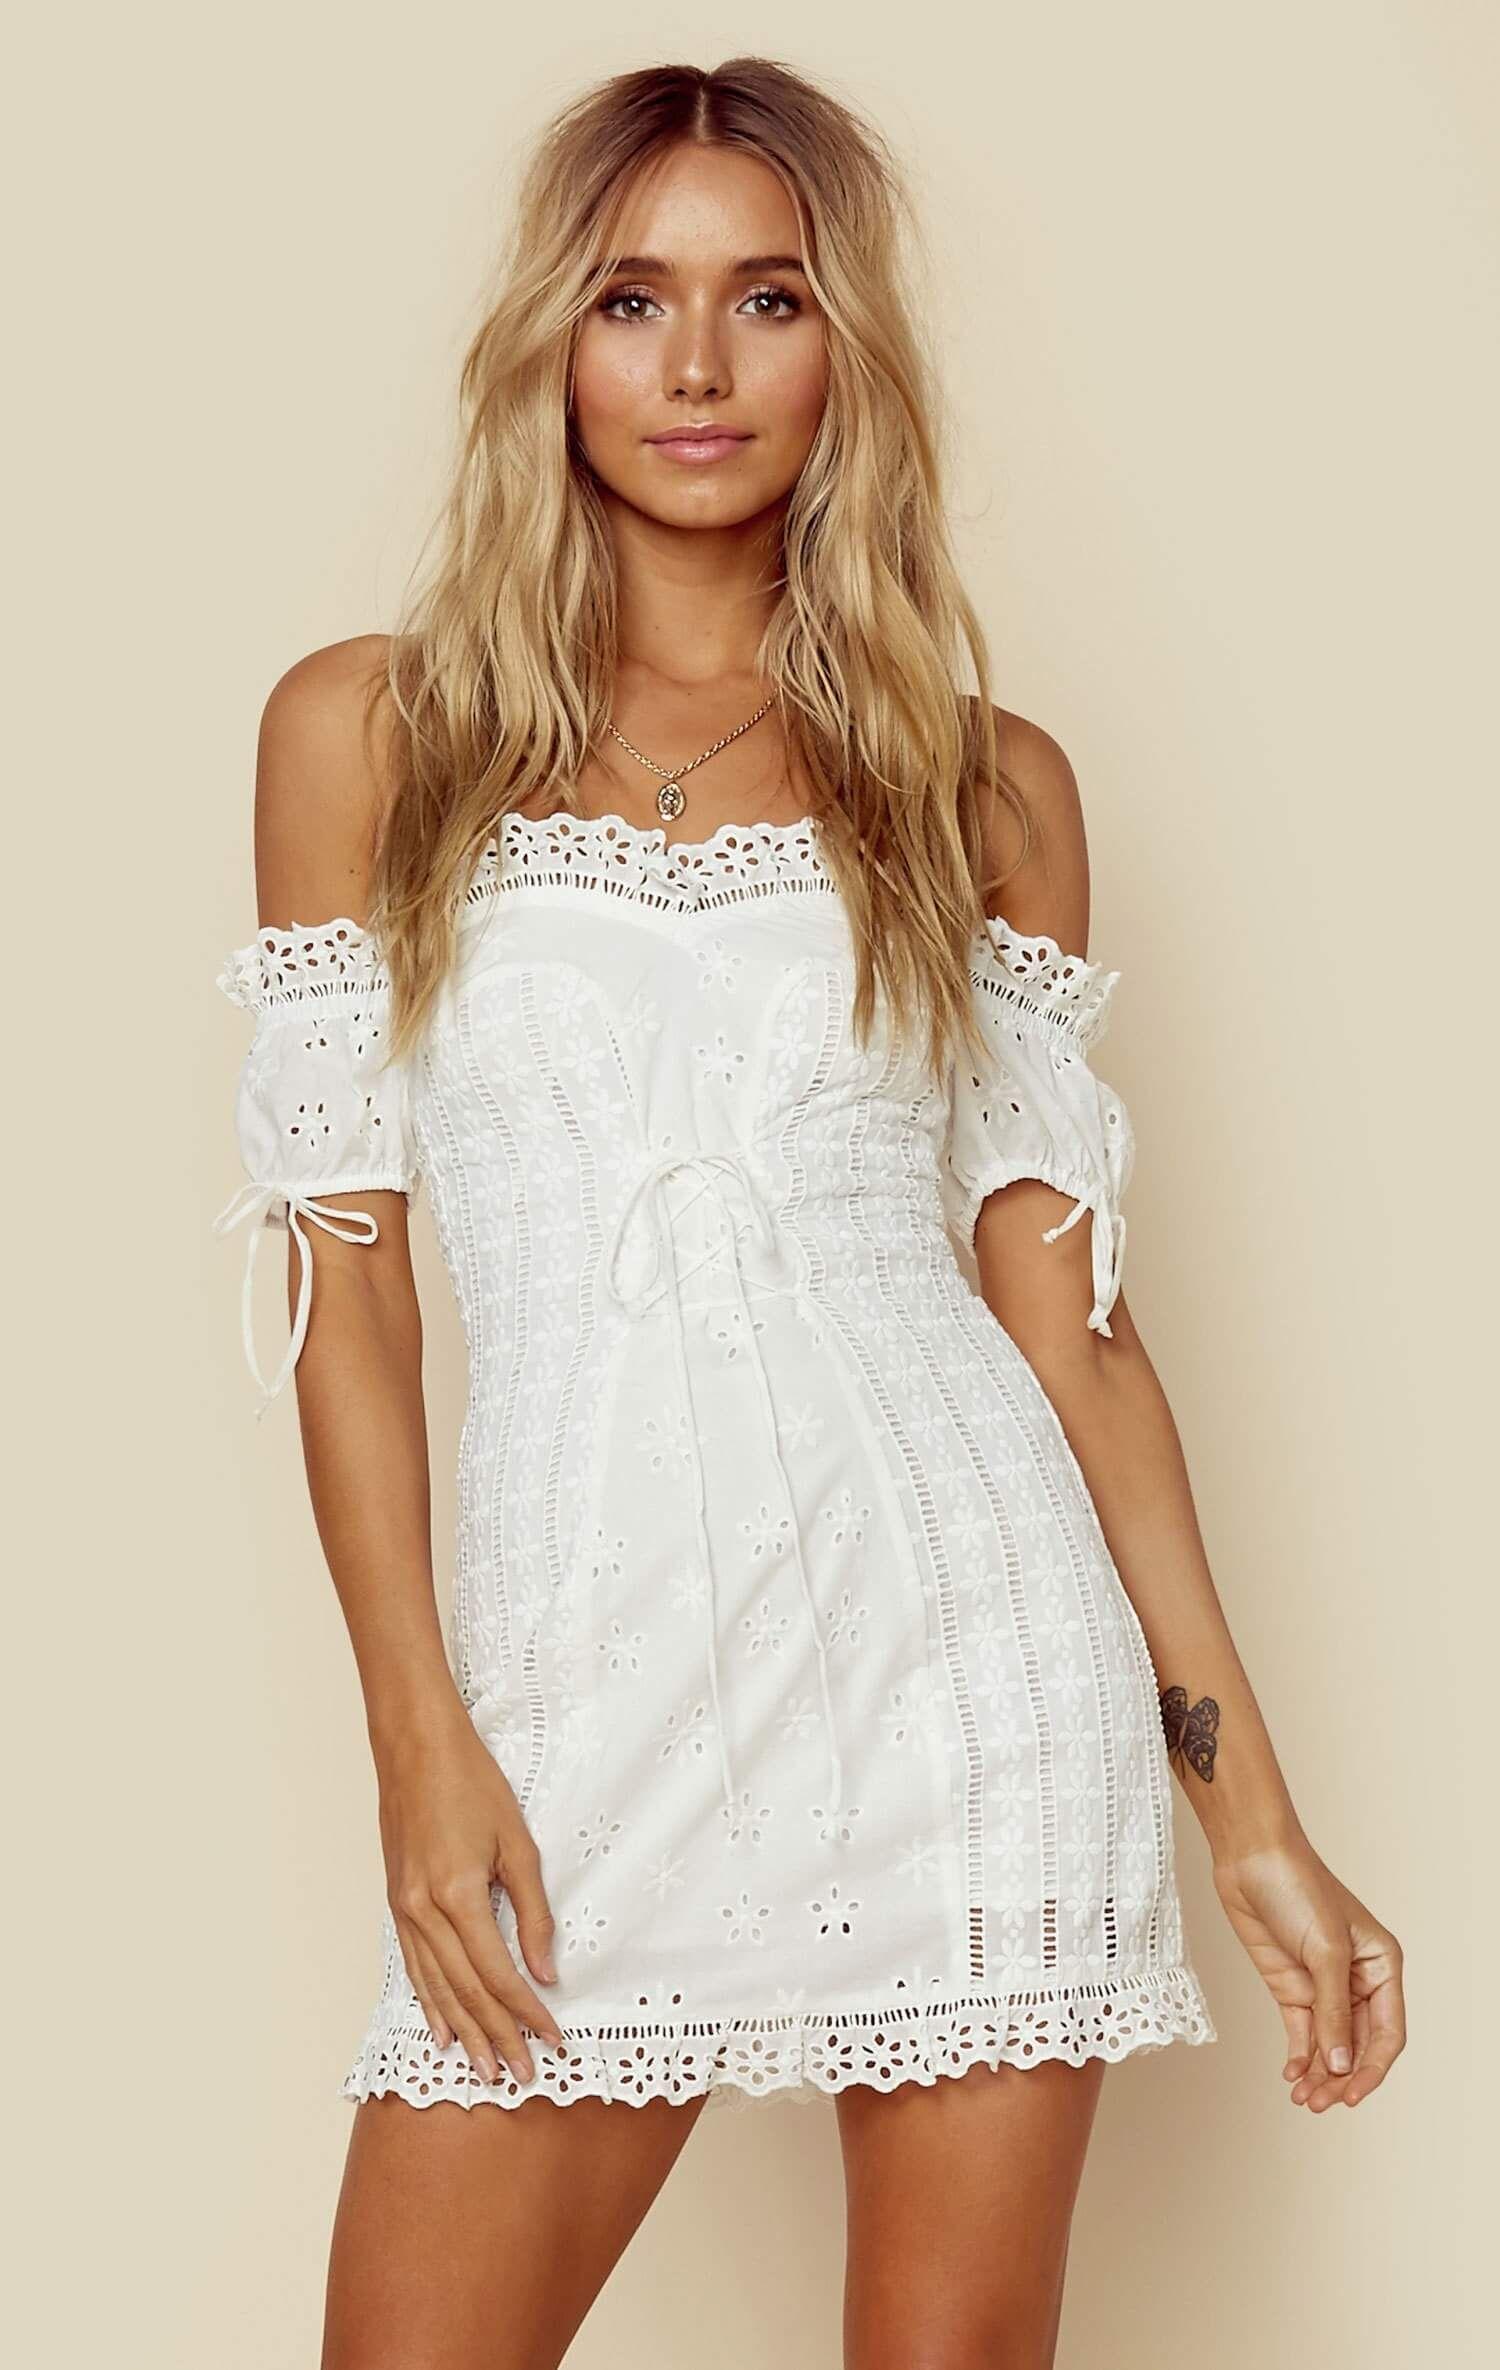 caab1617efd8a Anabelle eyelet lace up dress | NEW ARRIVALS | Dresses, Coachella ...